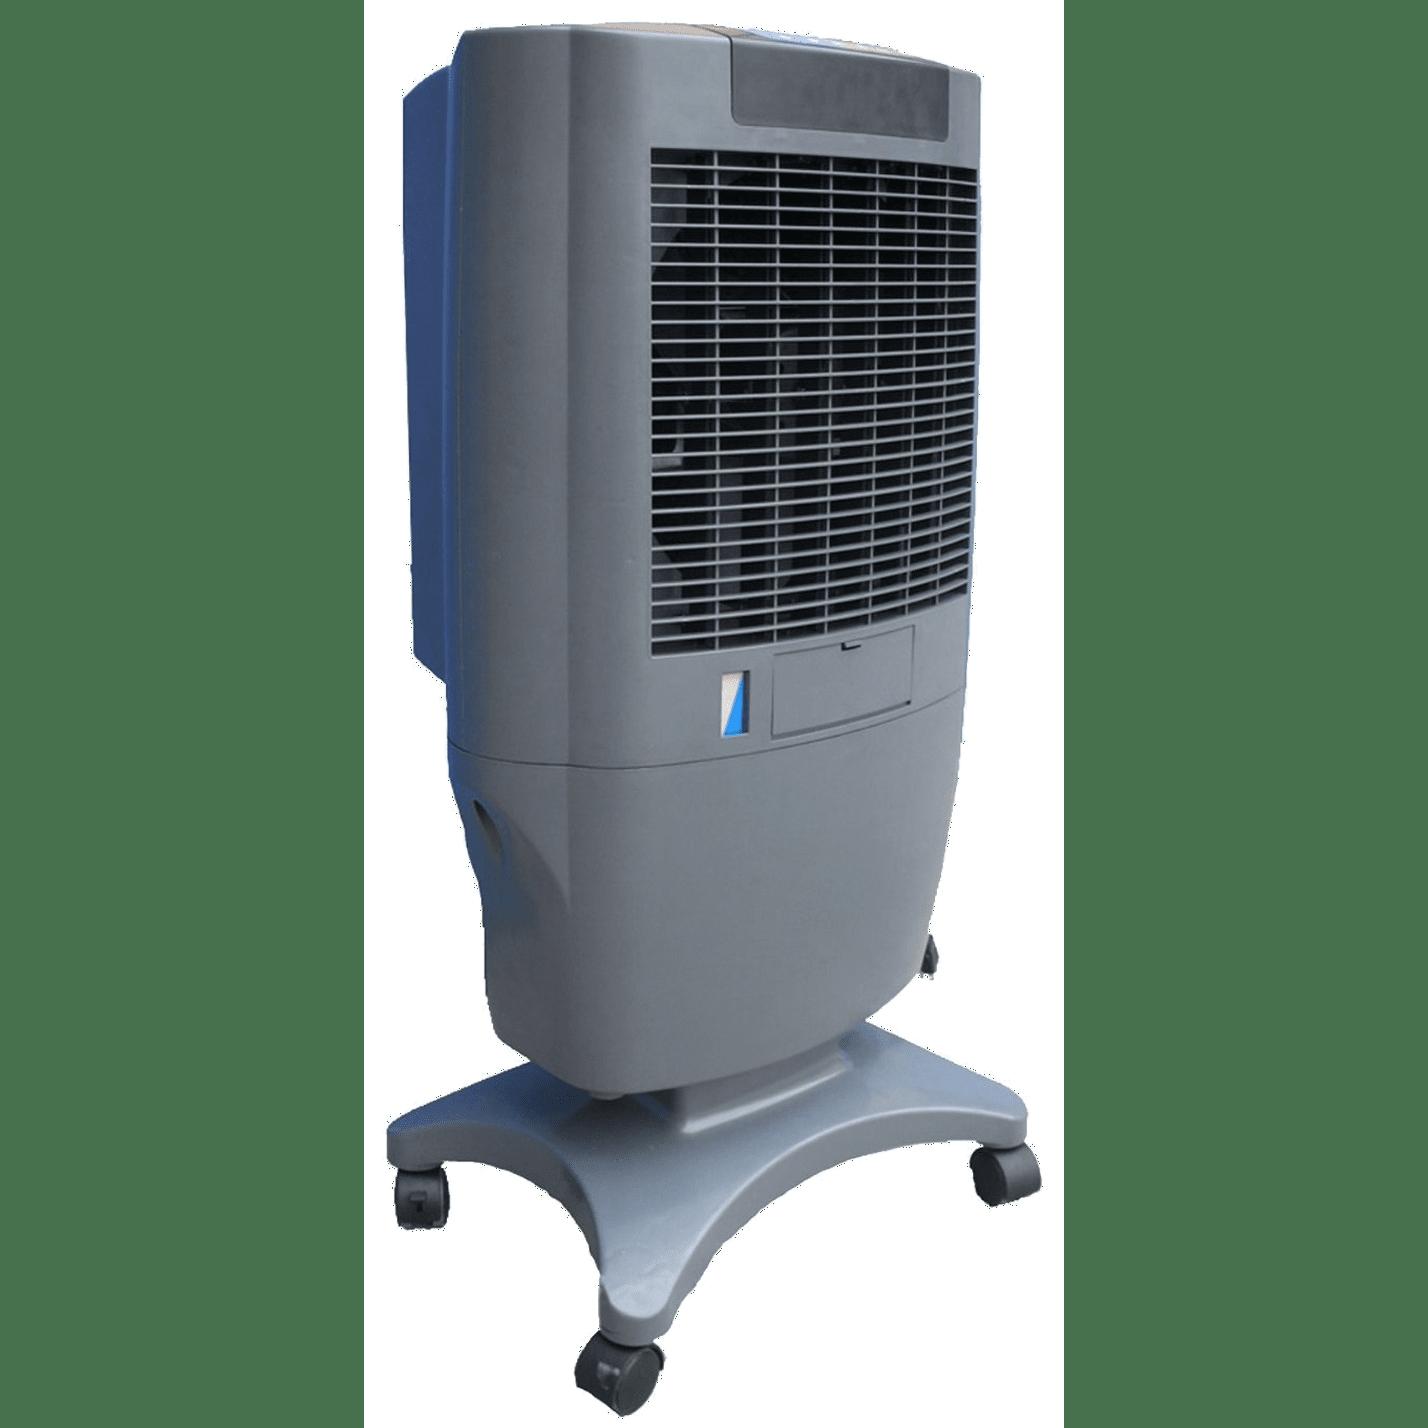 Champion CP70 Ultracool Evaporative Cooler